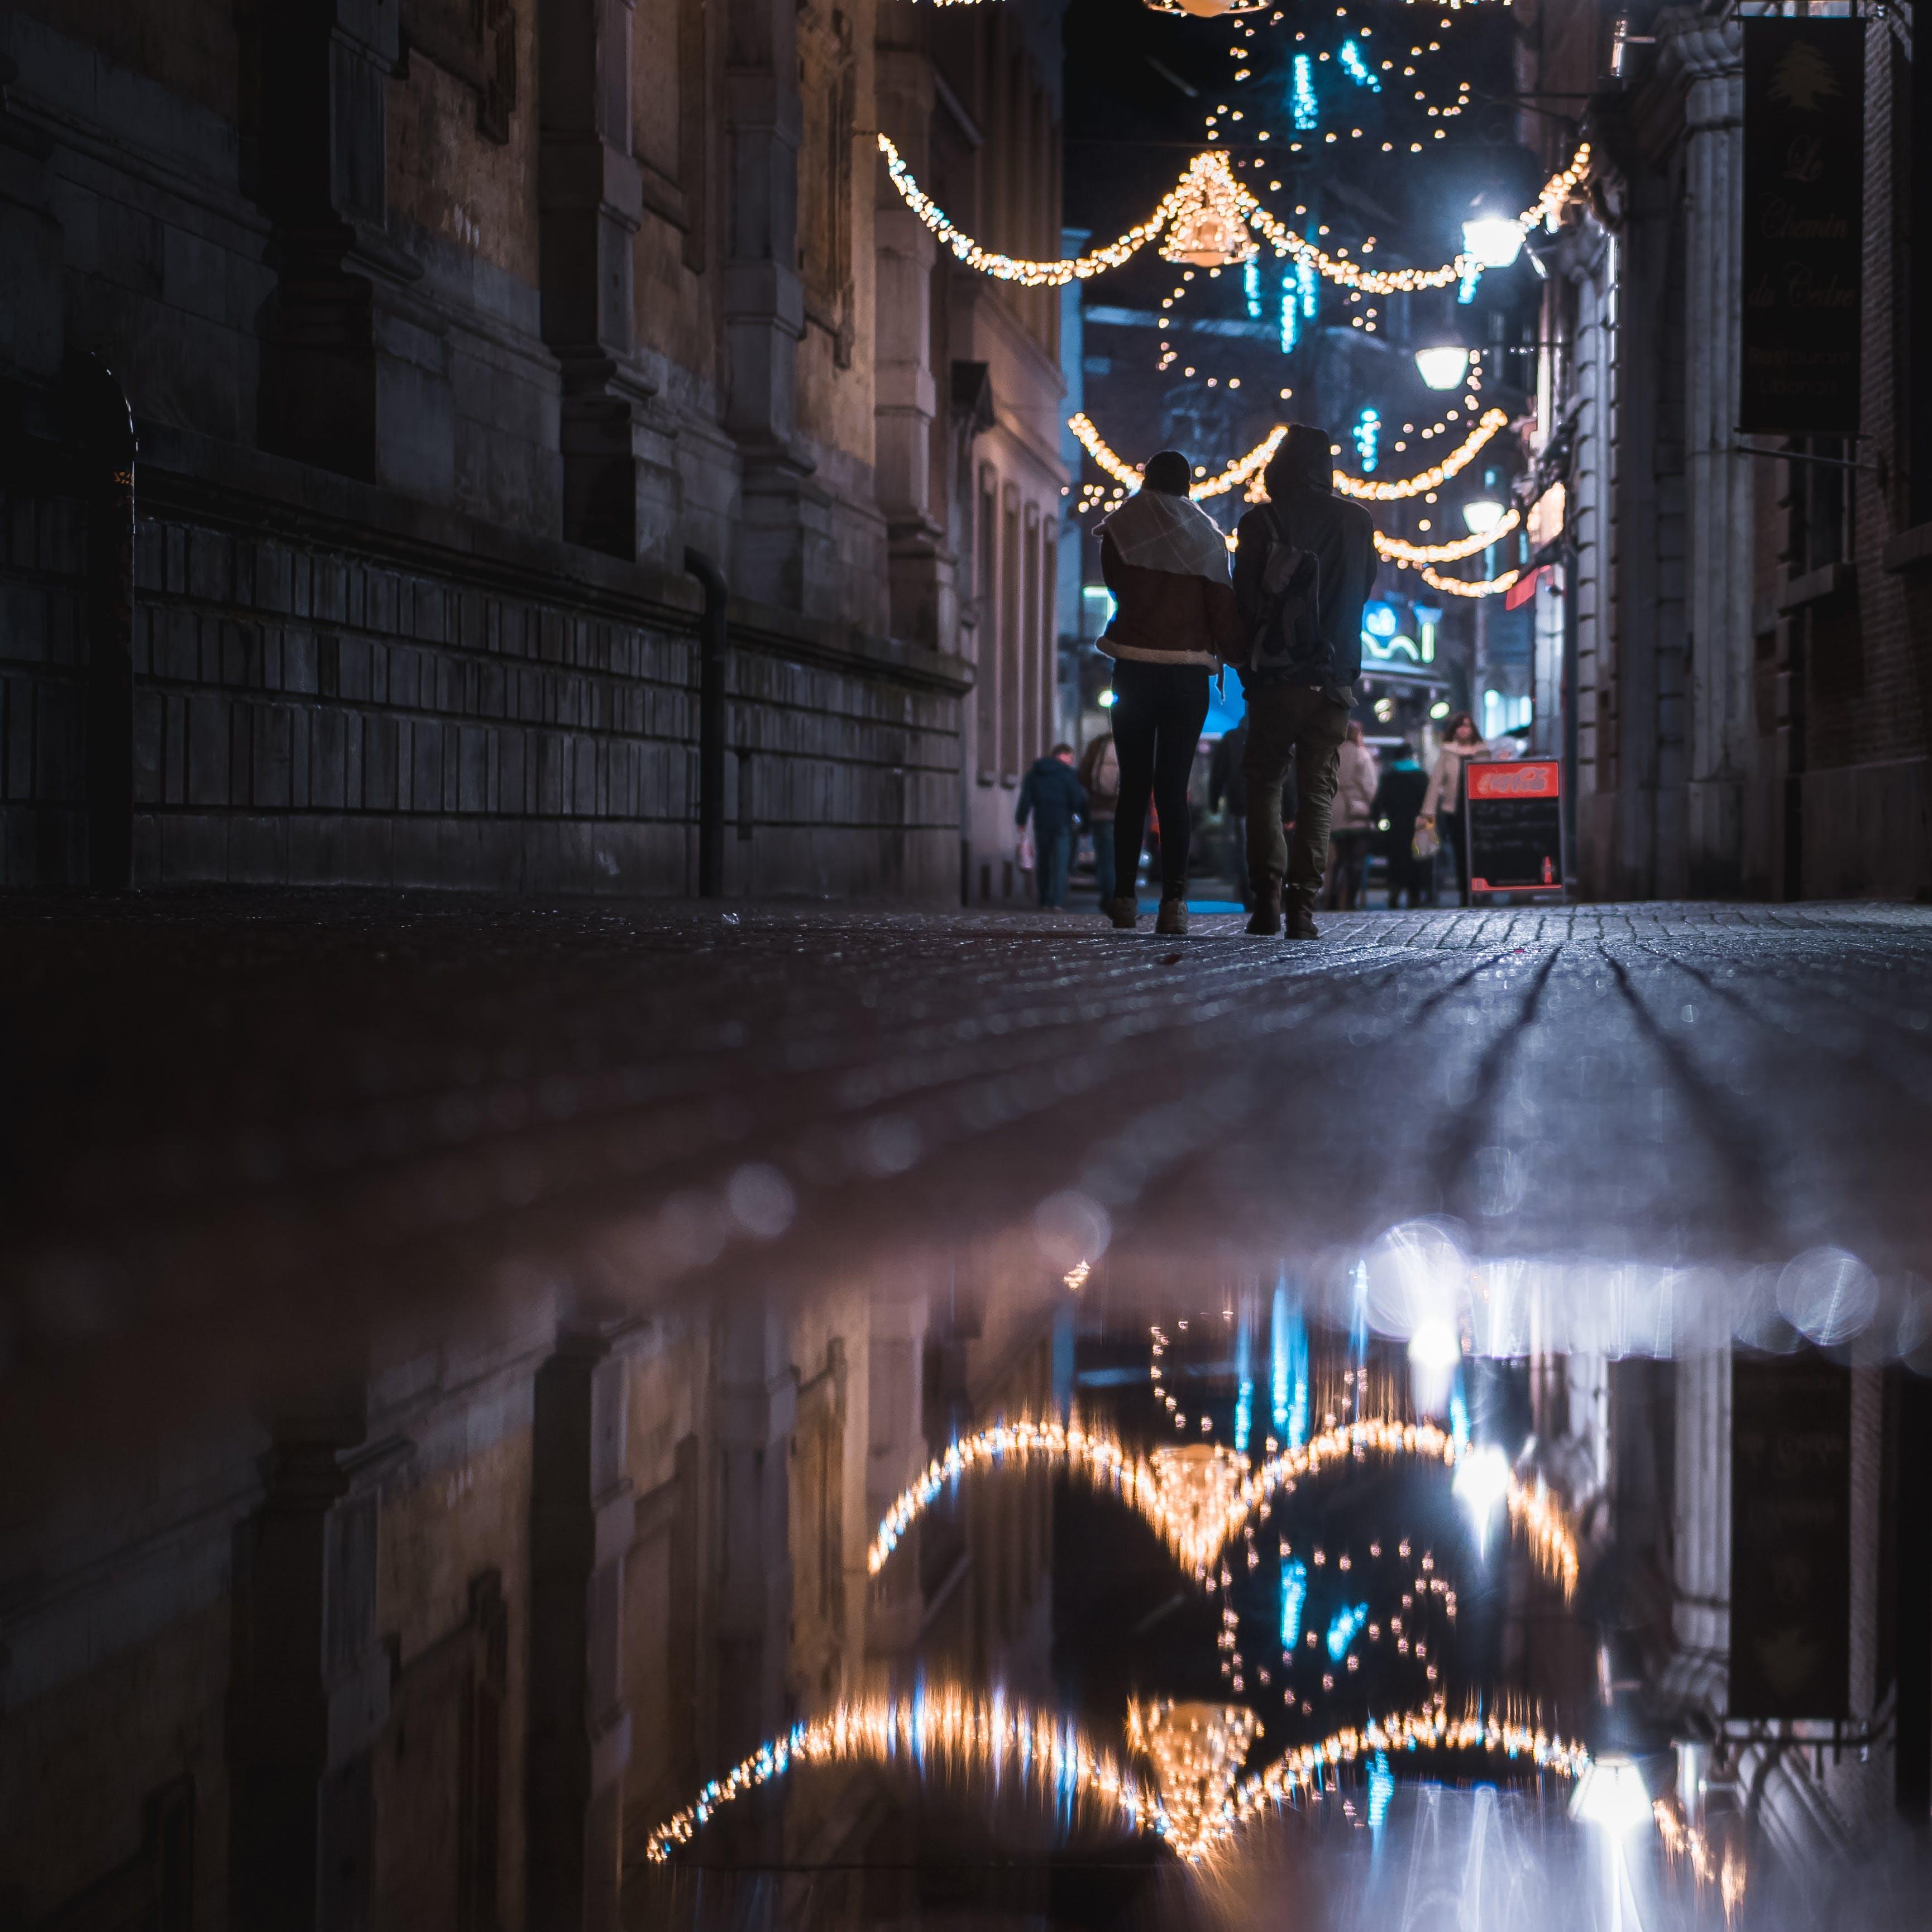 Two Person Walking on Street Corner